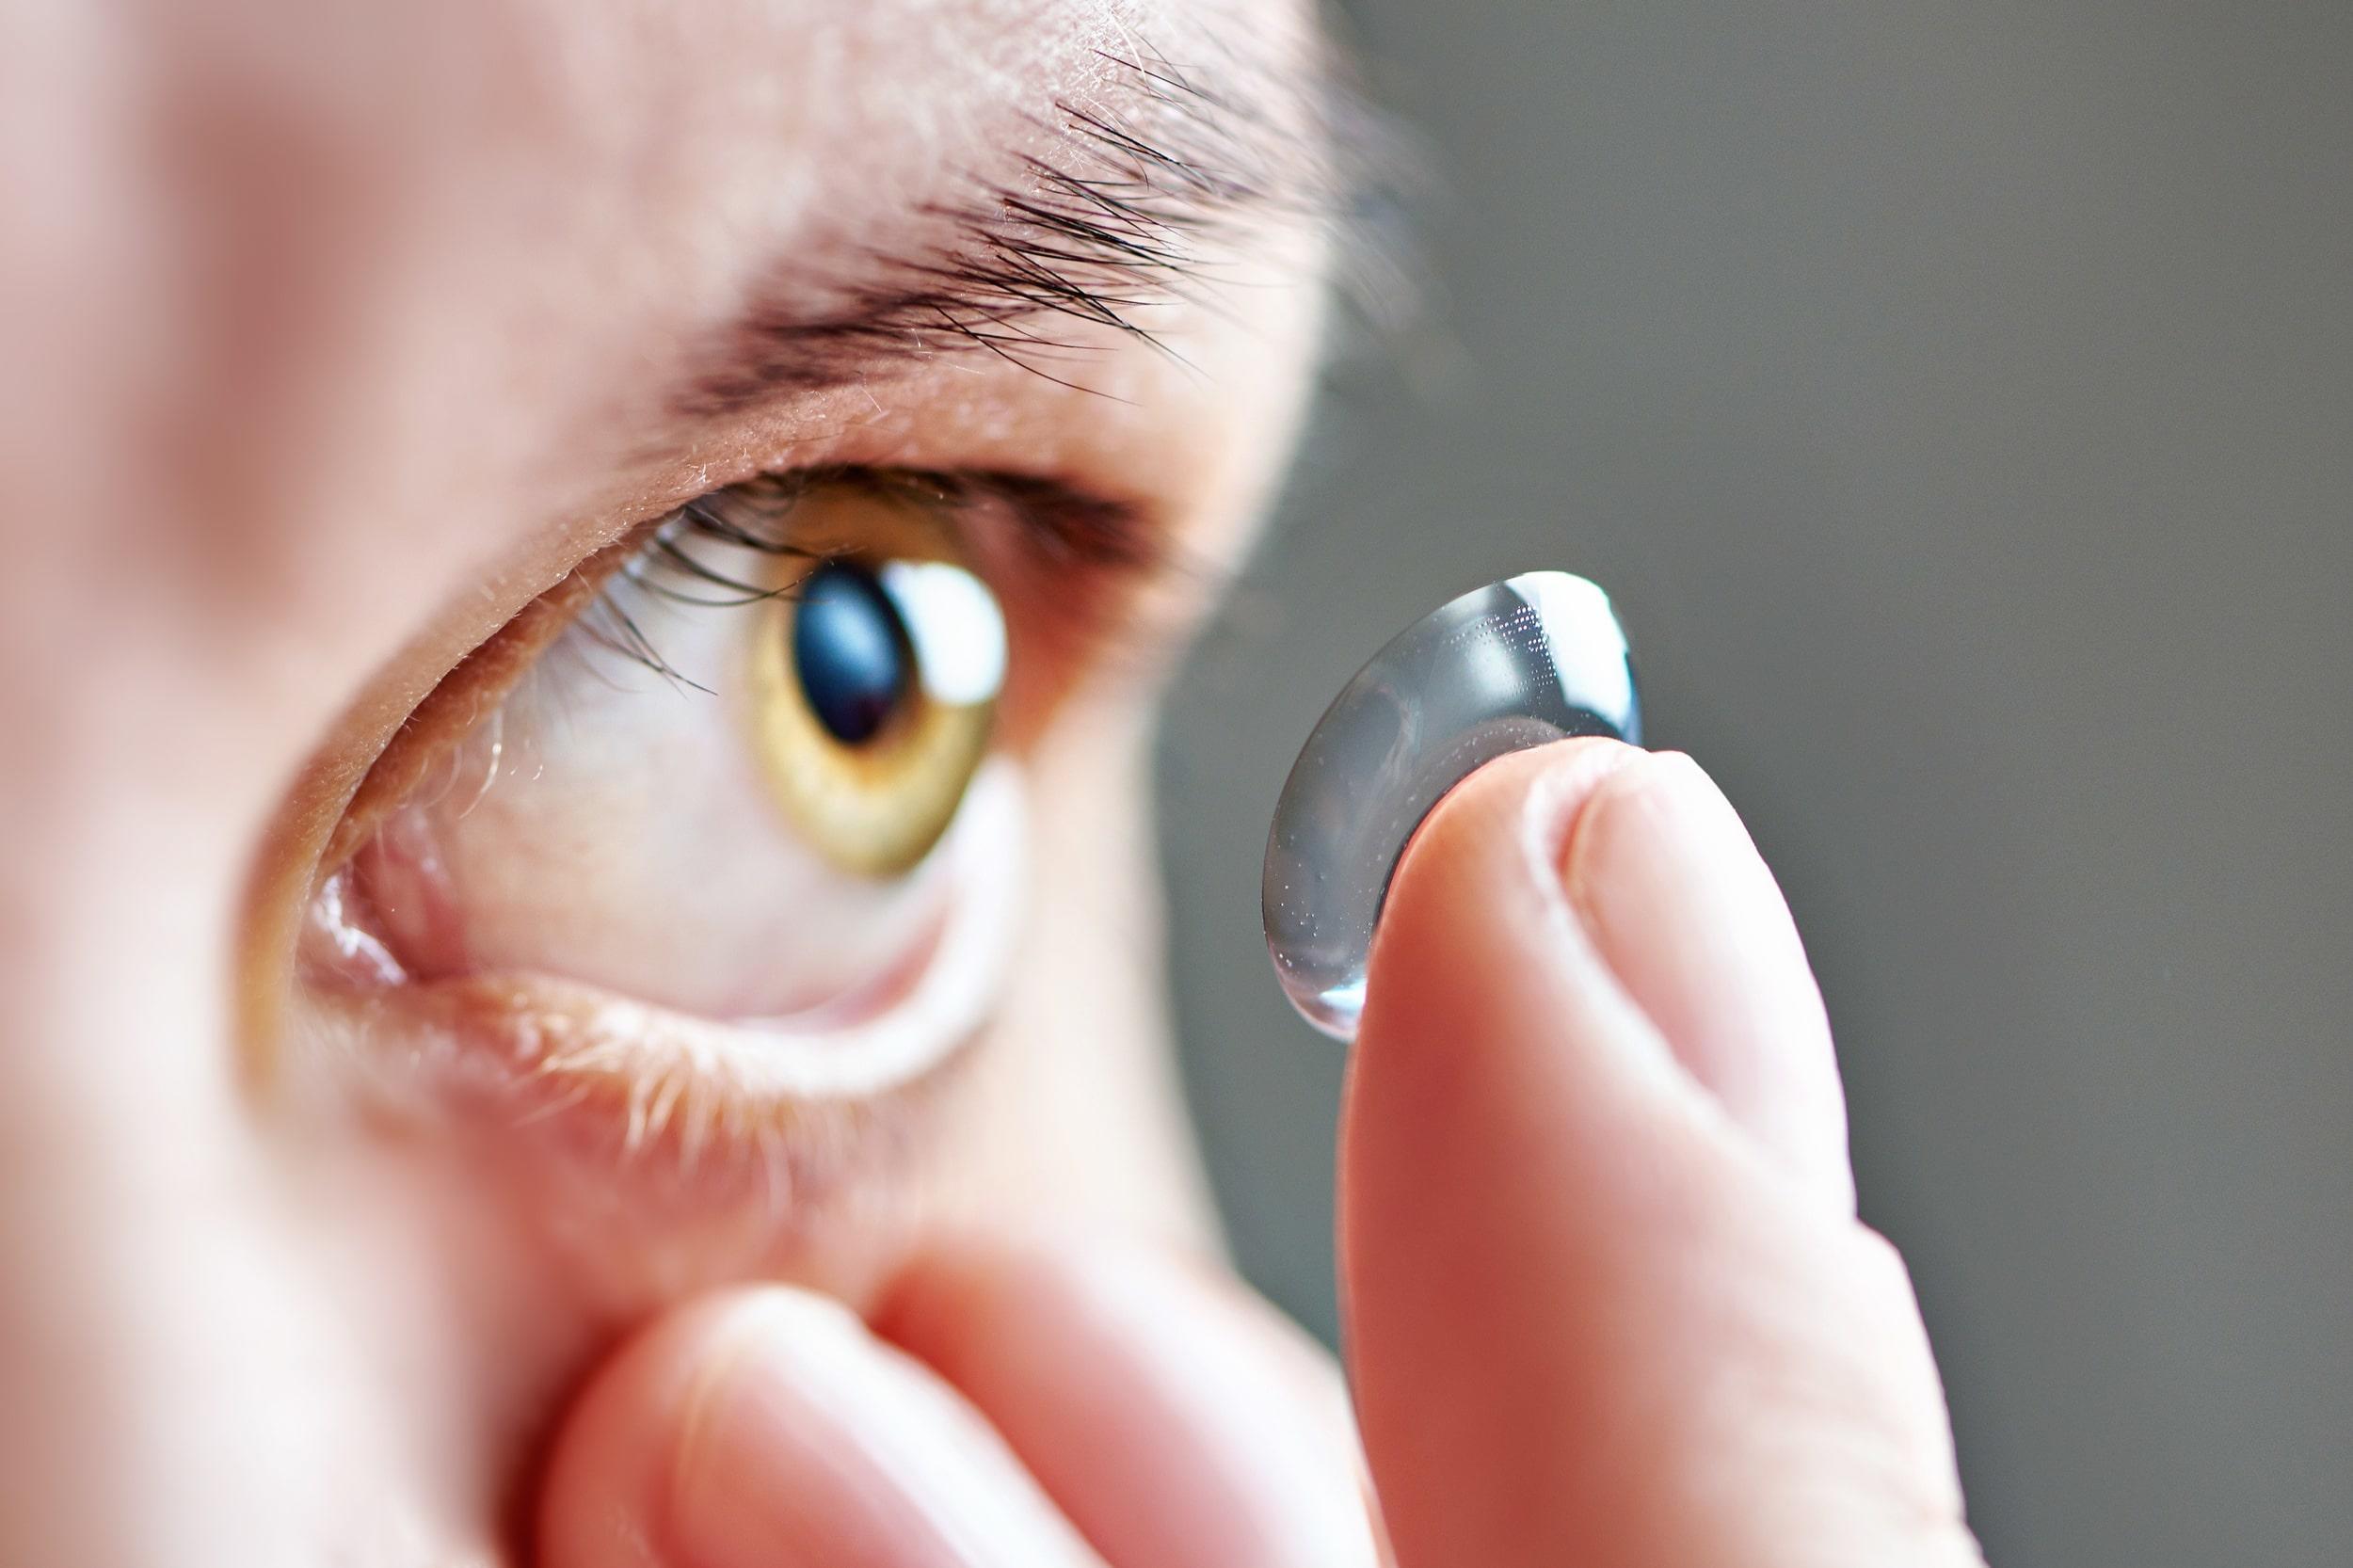 Contact lense and eye